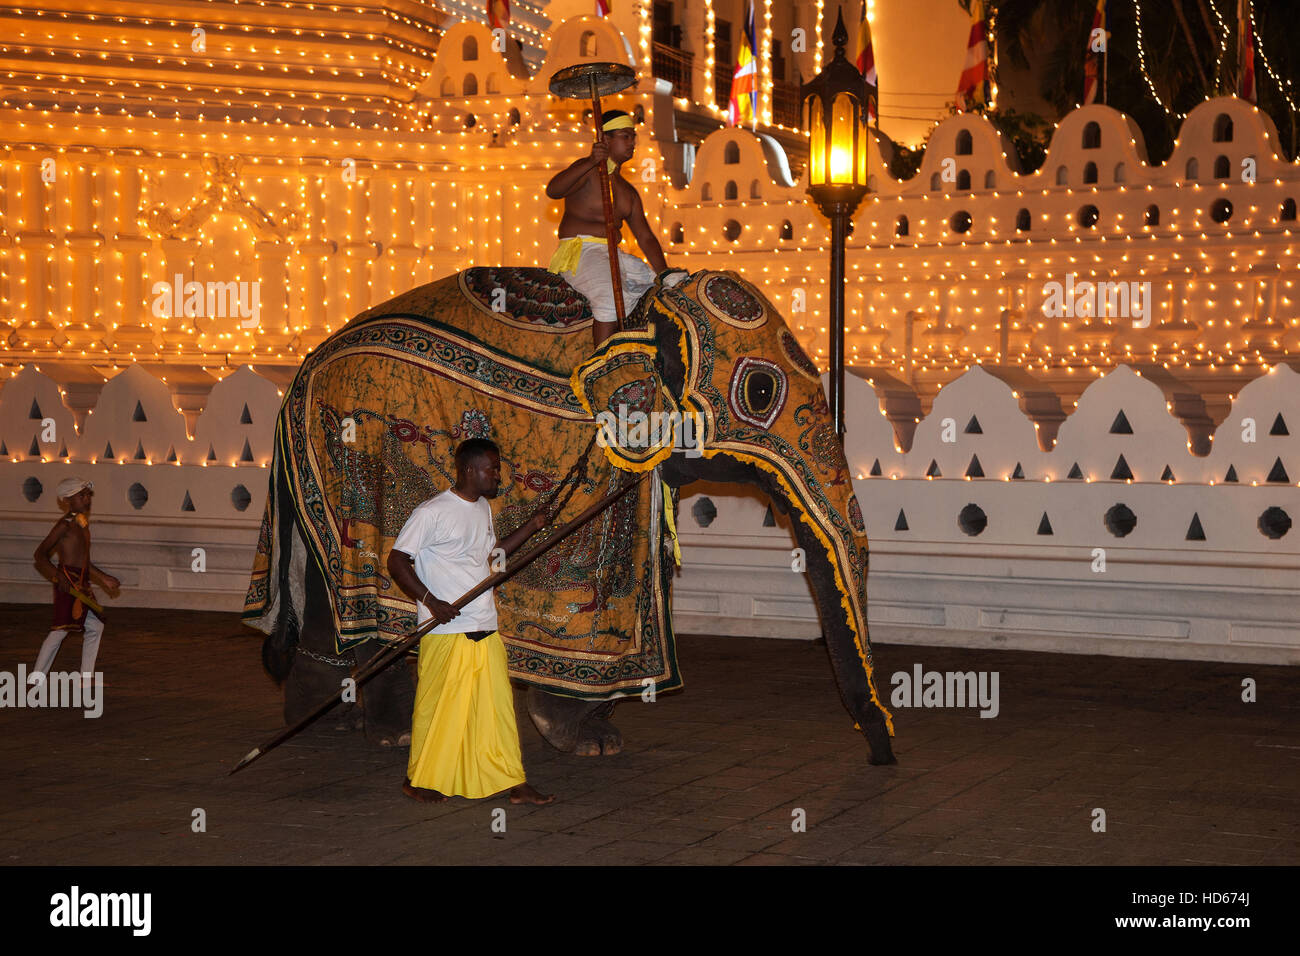 Decorated elephant, Buddhist festival Esala Perahera, in ...